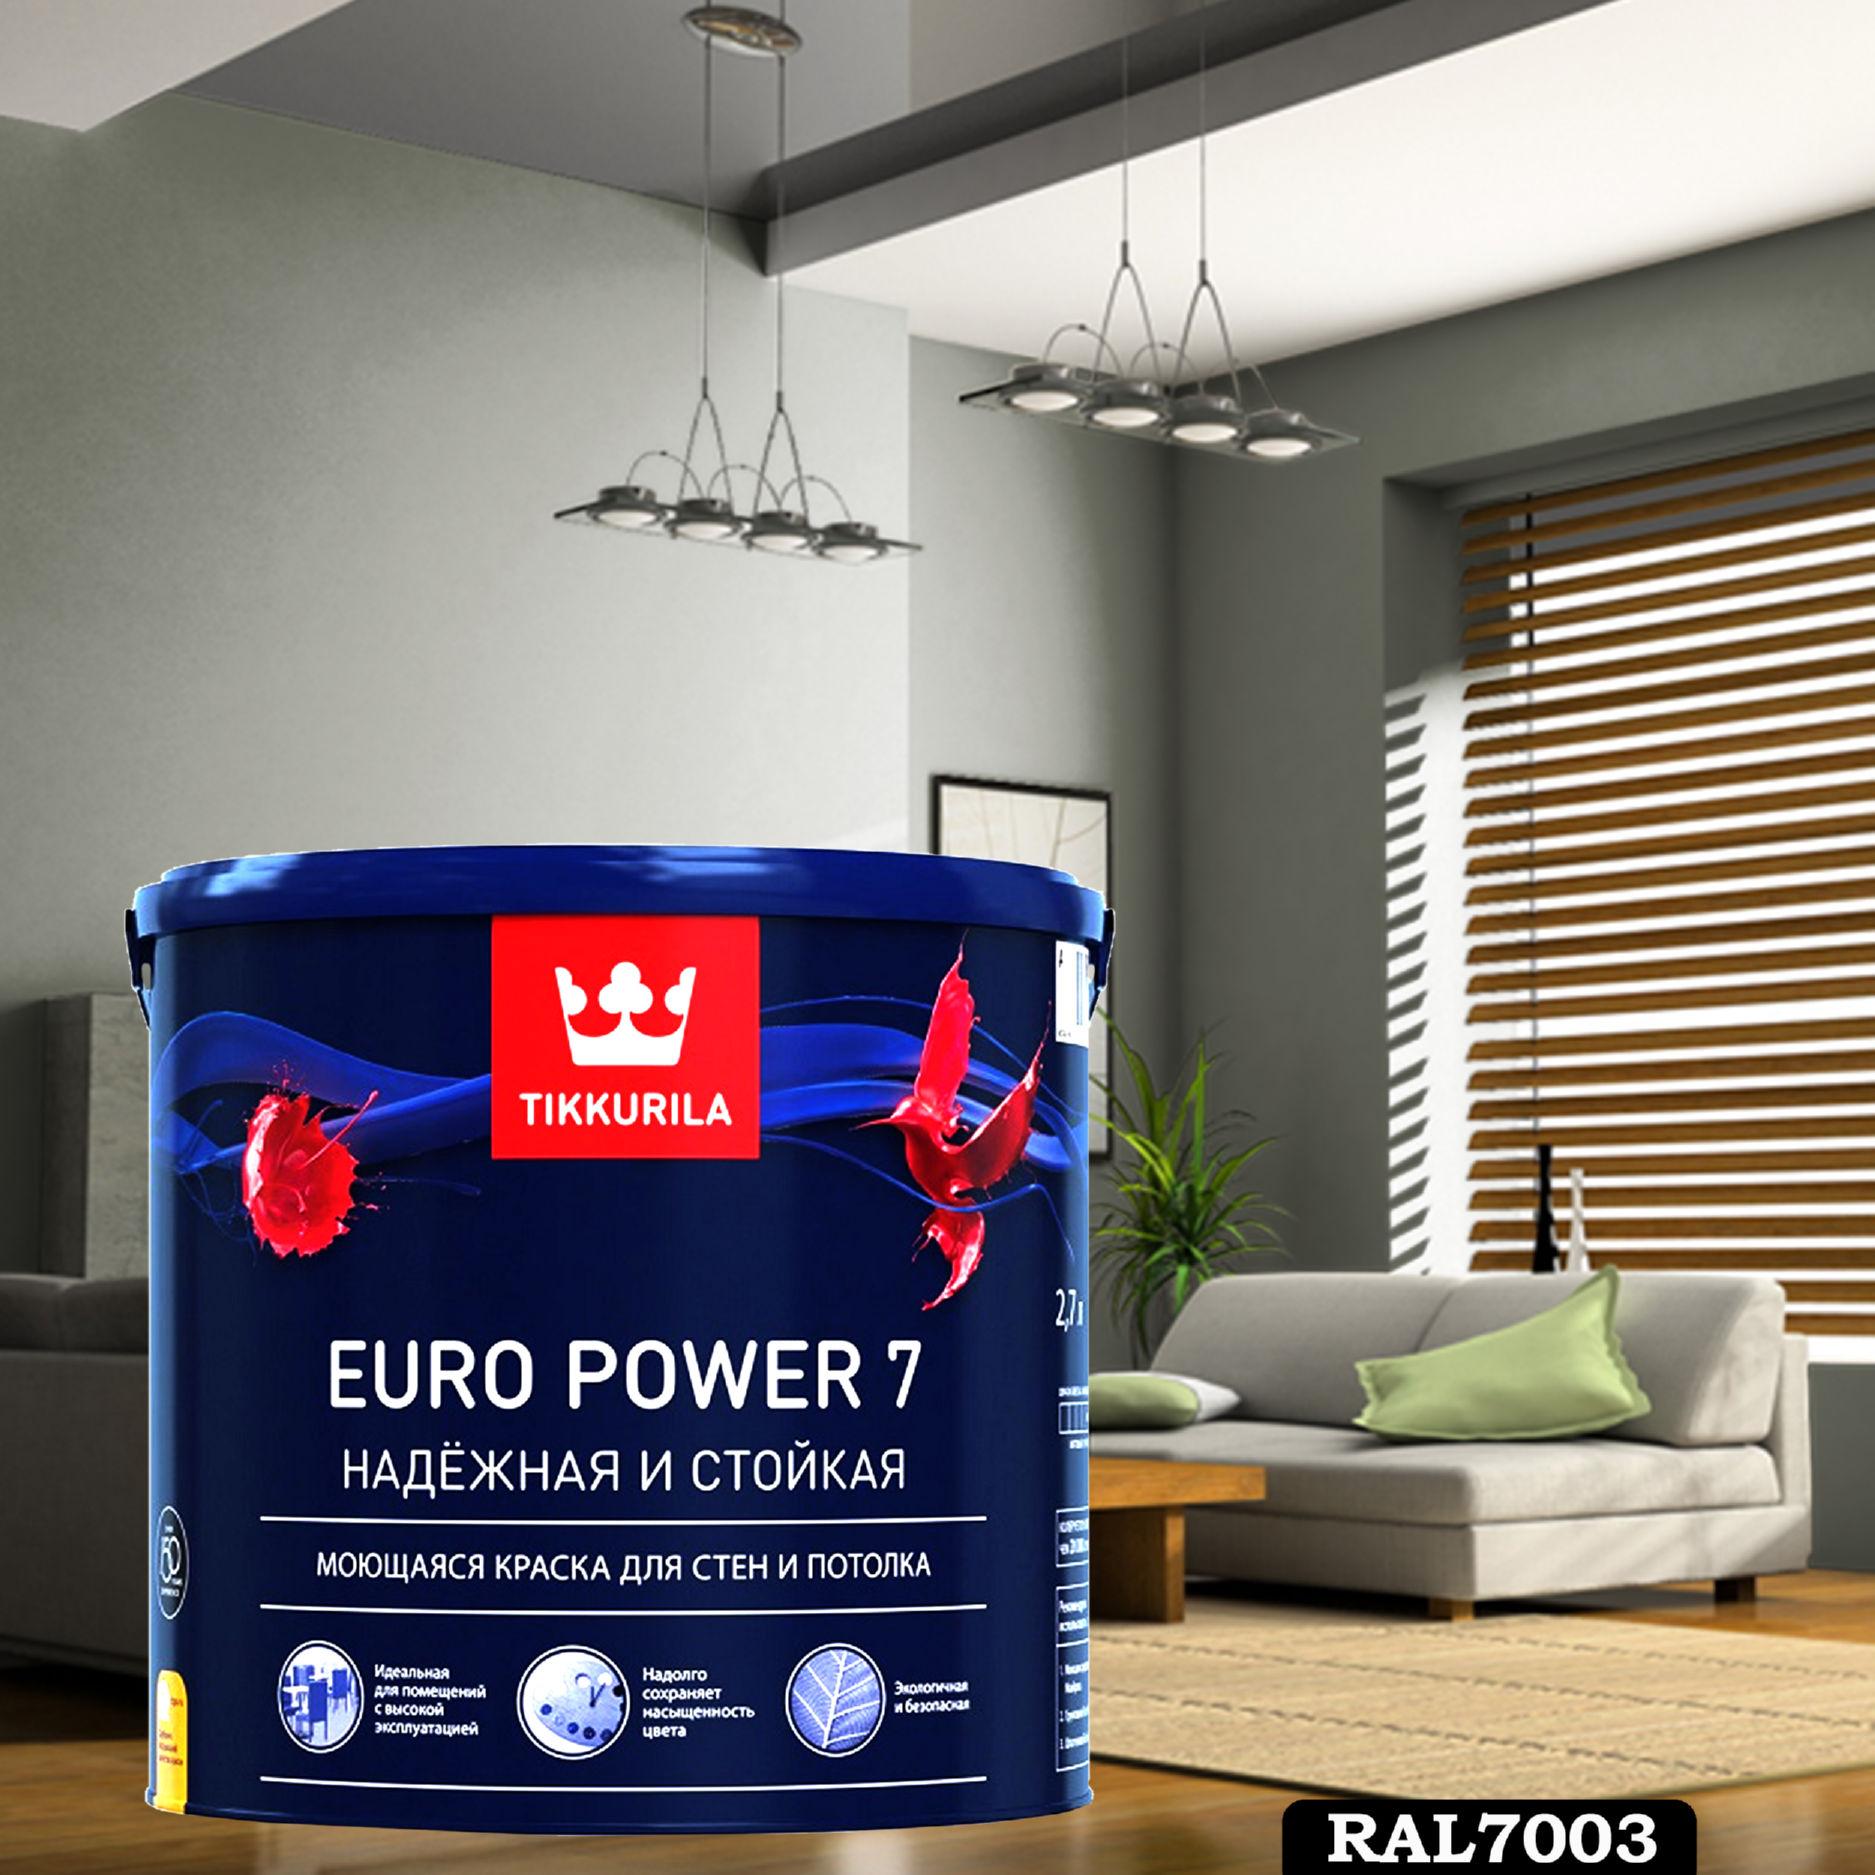 Фото 4 - Краска TIKKURILA Euro Power 7,  RAL 7003 Серый-мох, латексная моющаяся матовая интерьерная, 9 л.